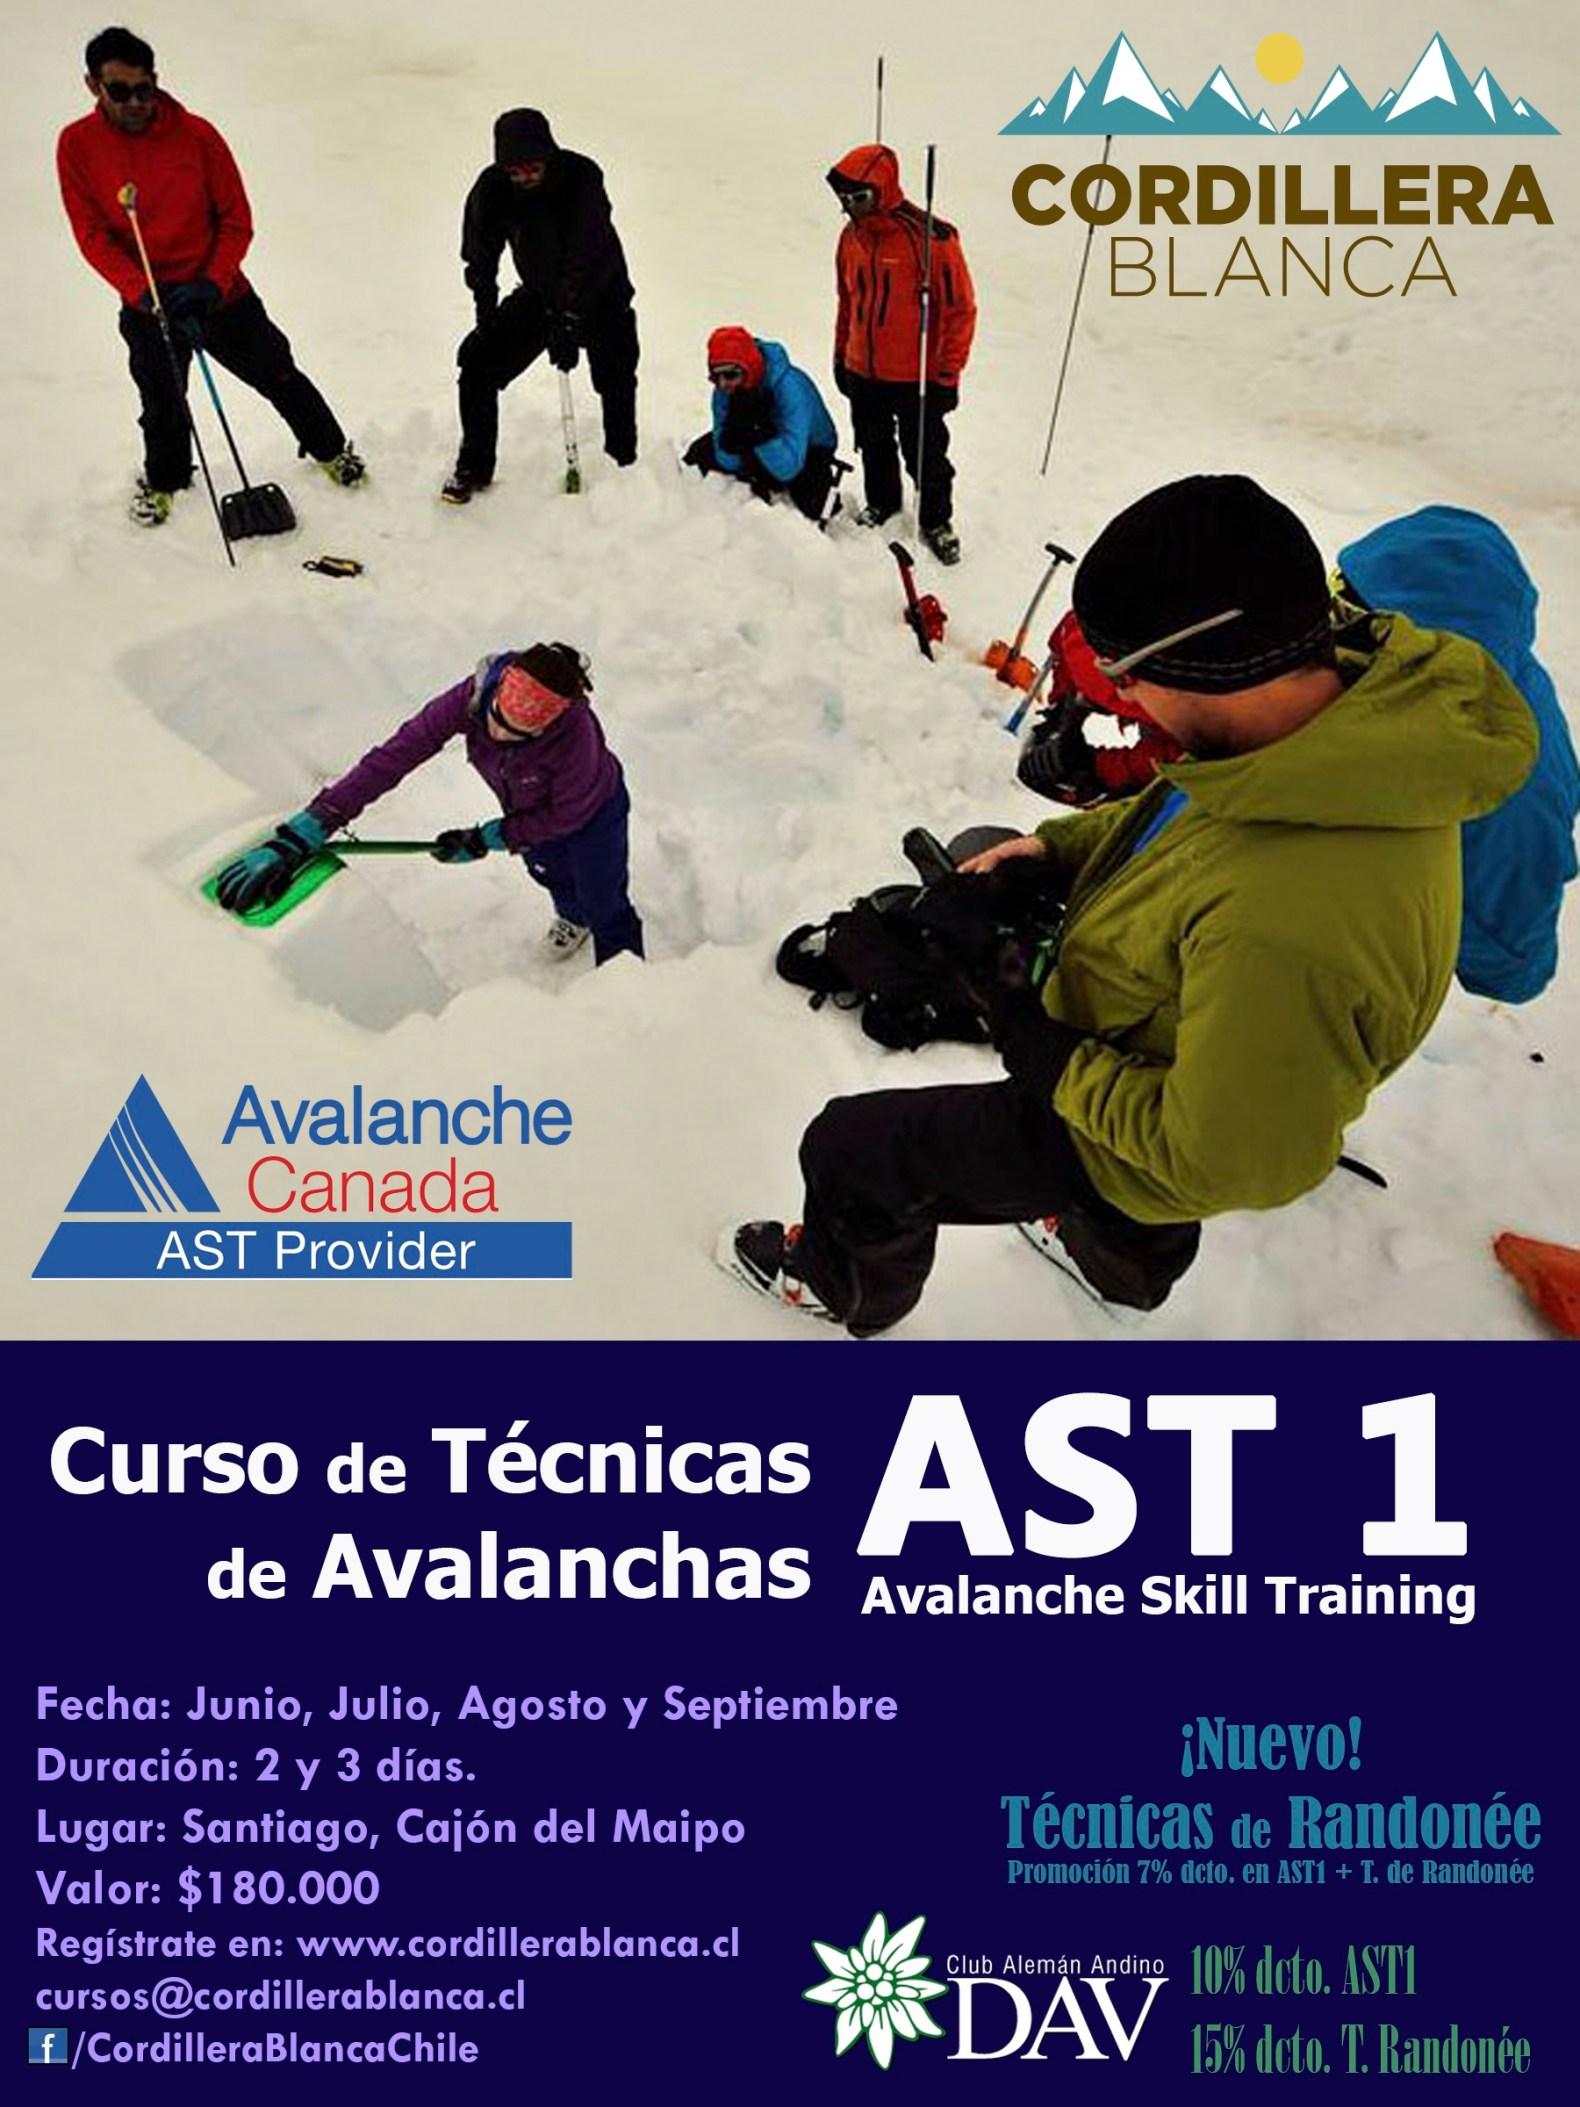 Curso de Técnicas de Avalanchas AST1